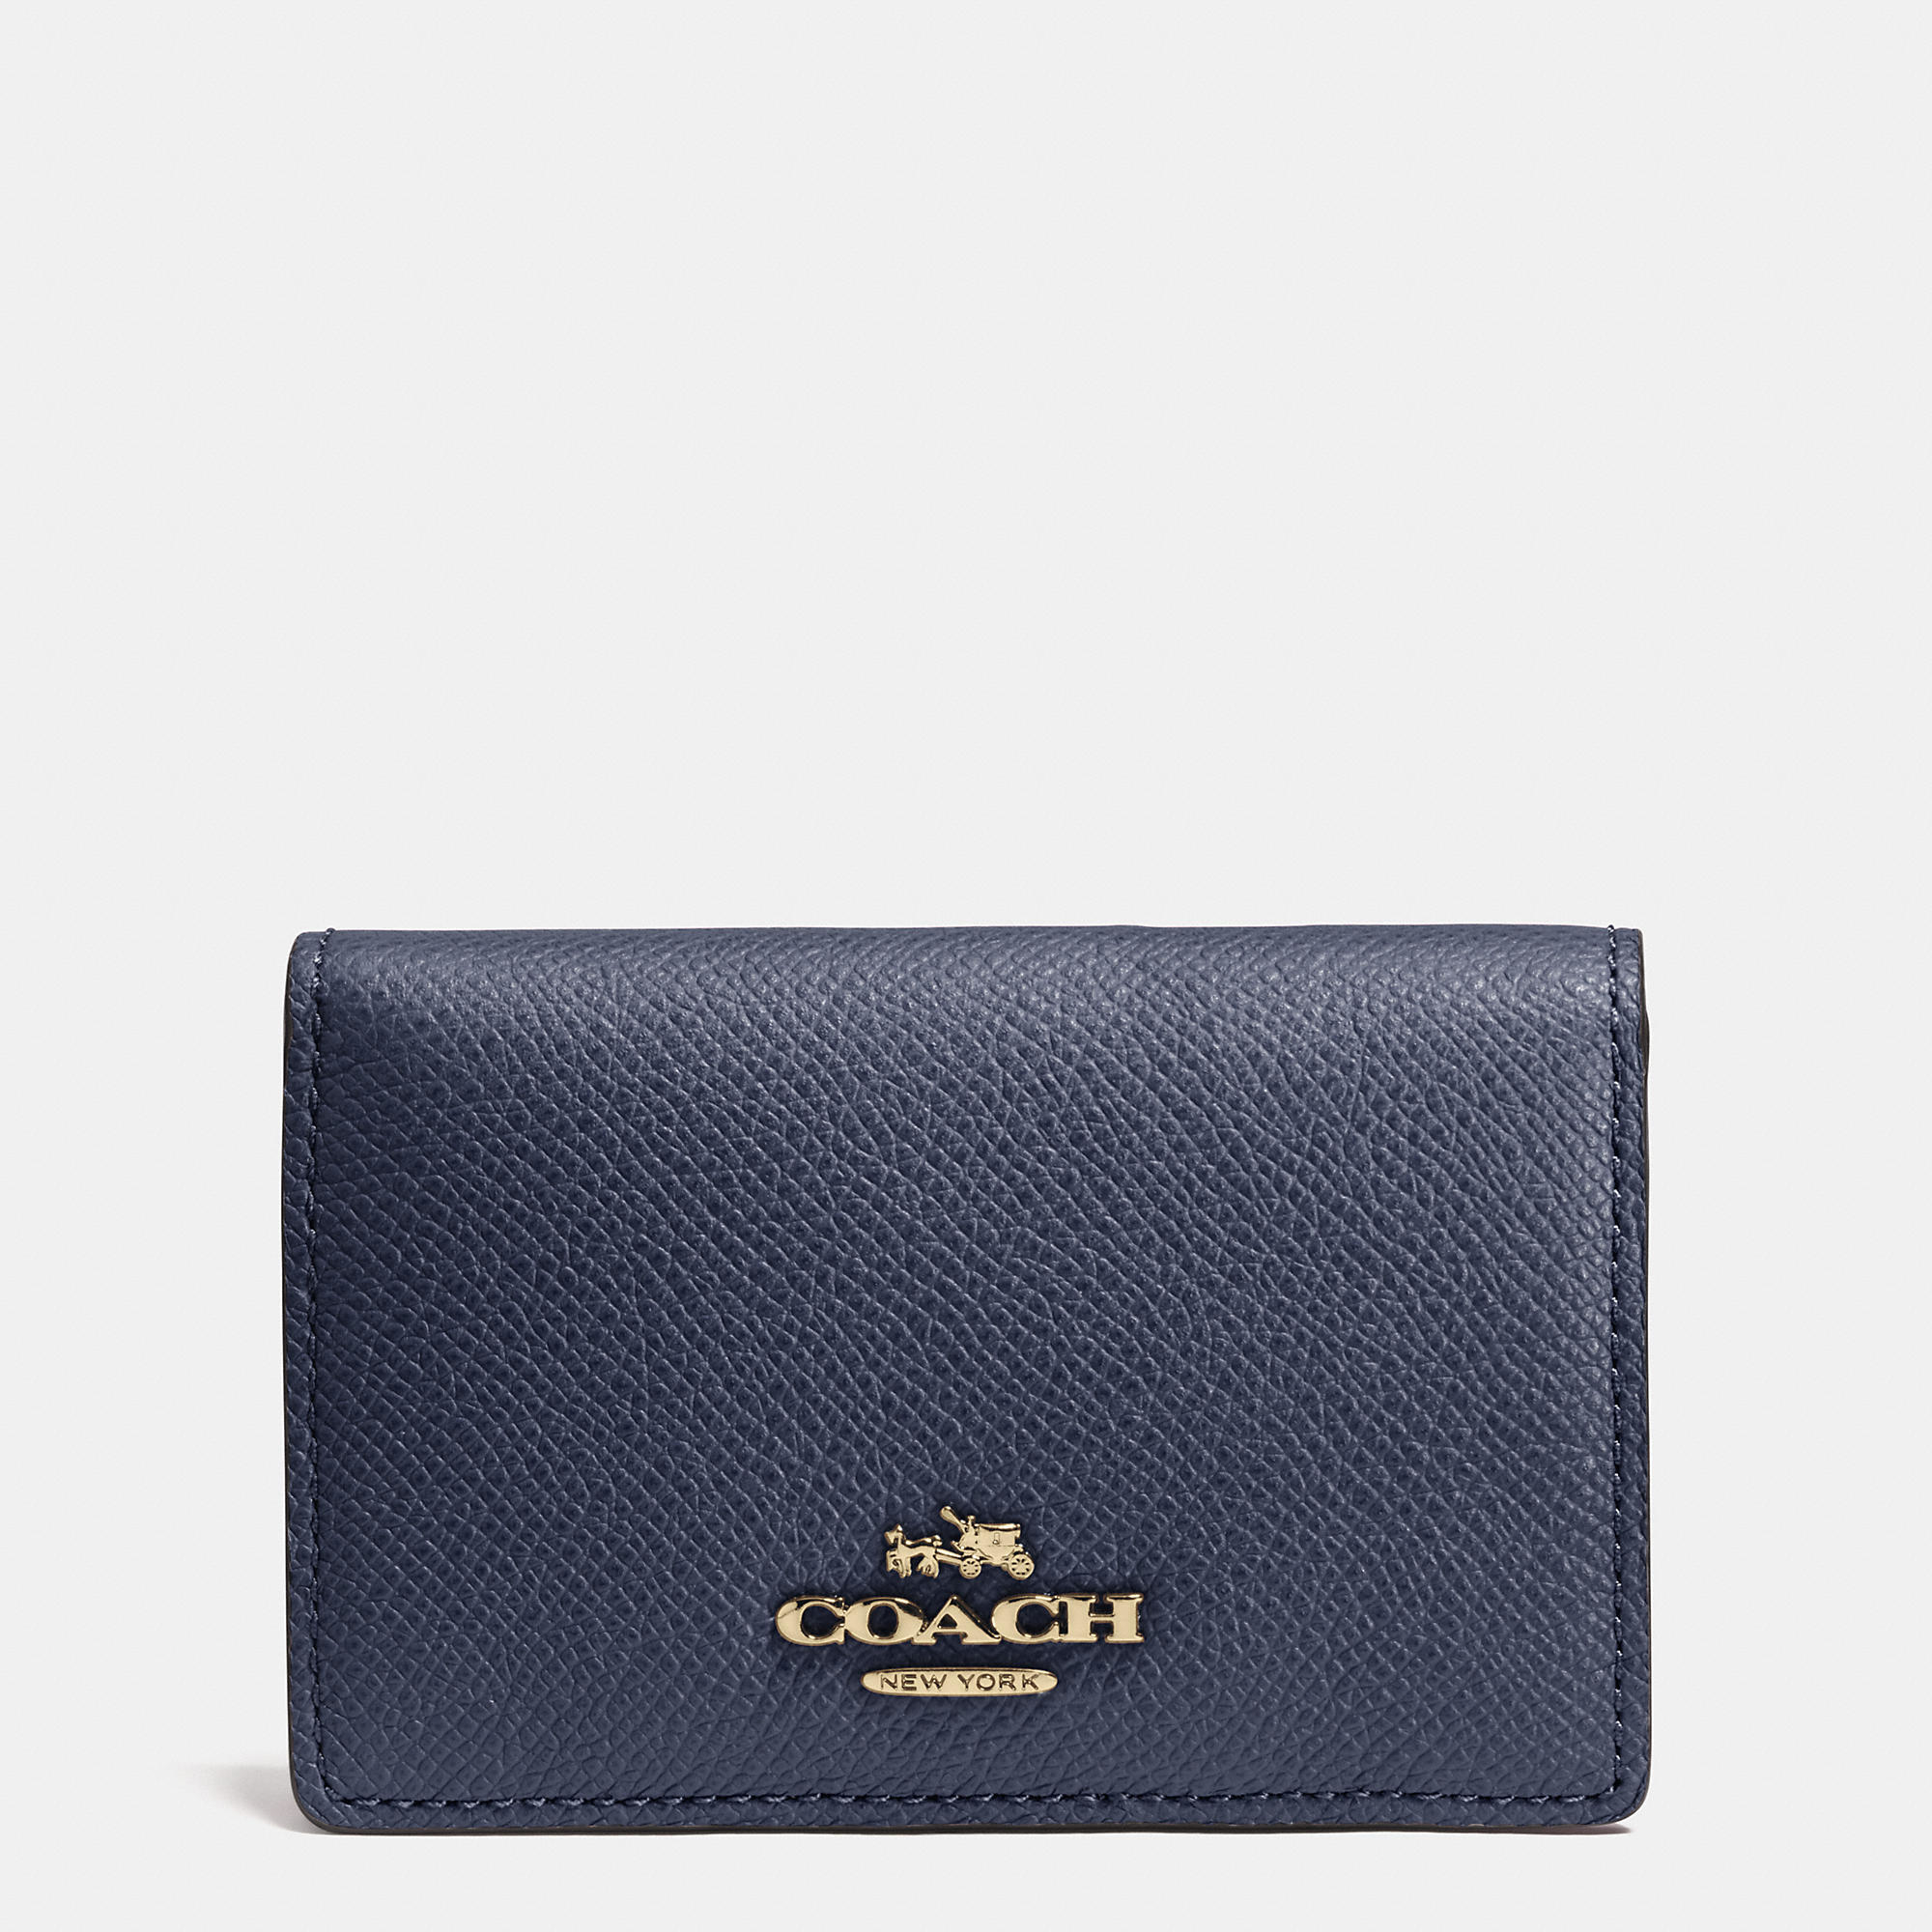 Lyst - Coach Business Card Case In Crossgrain Leather in Blue